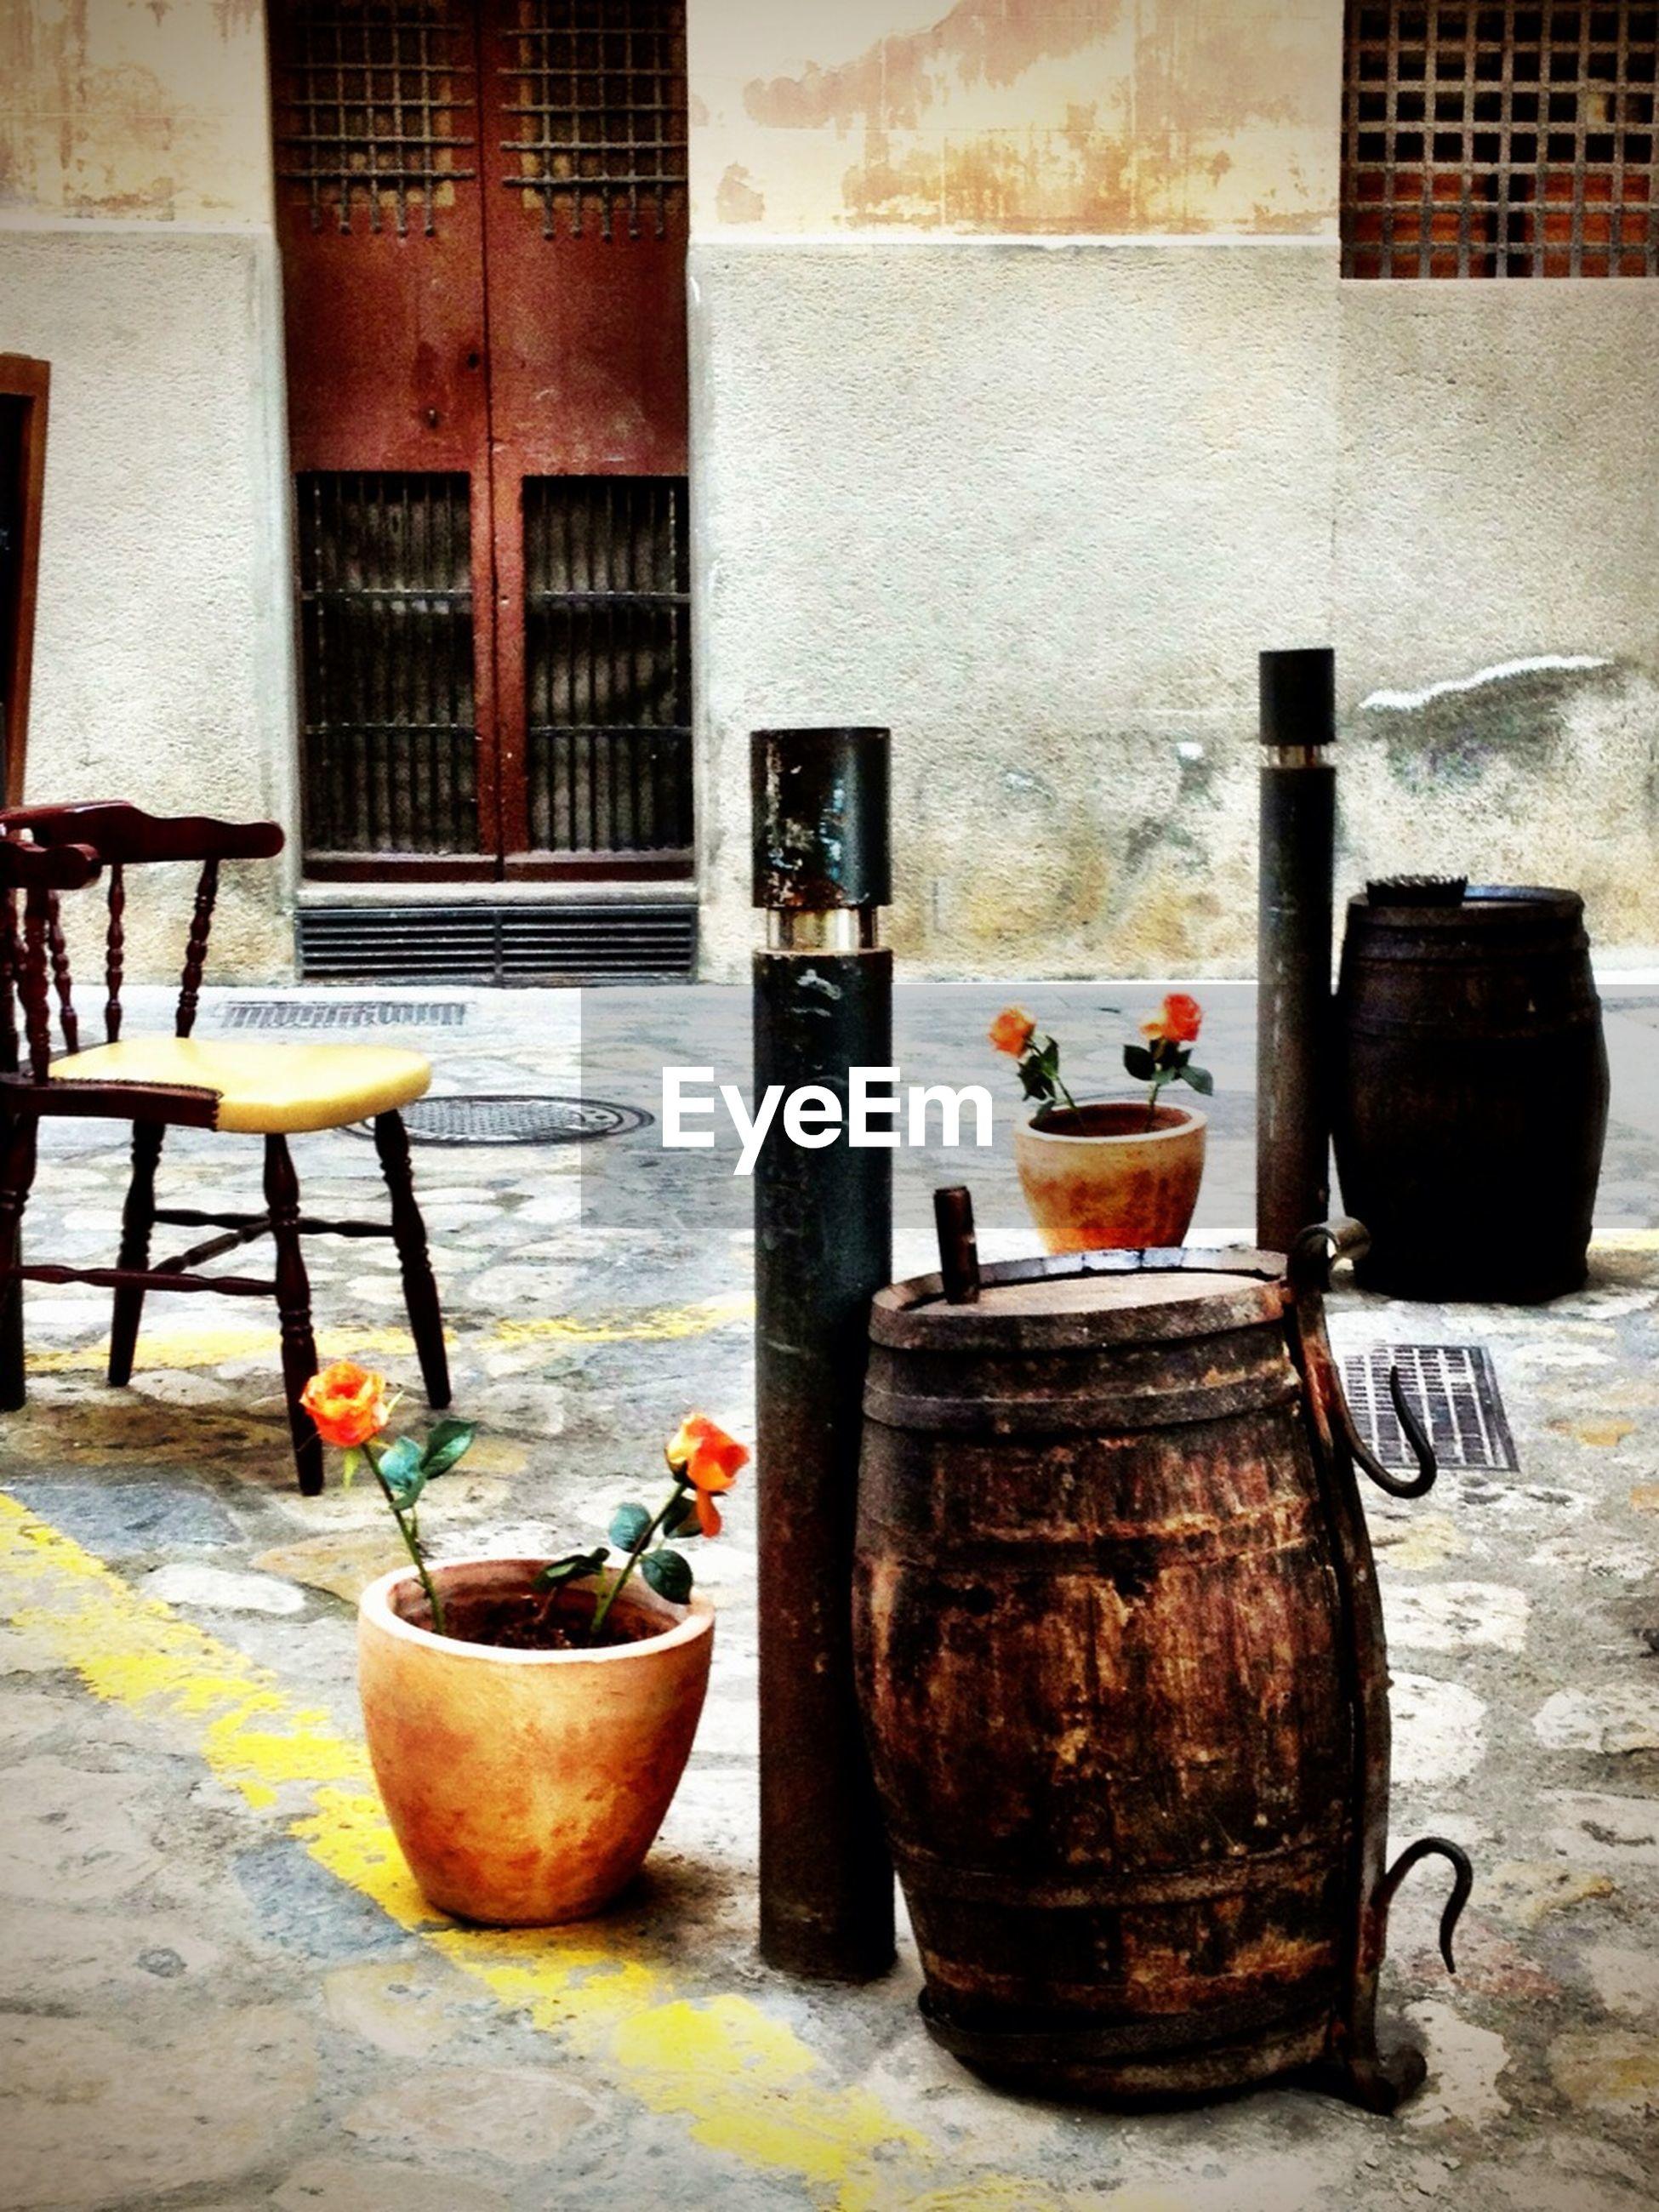 Barrels with flower pots in courtyard